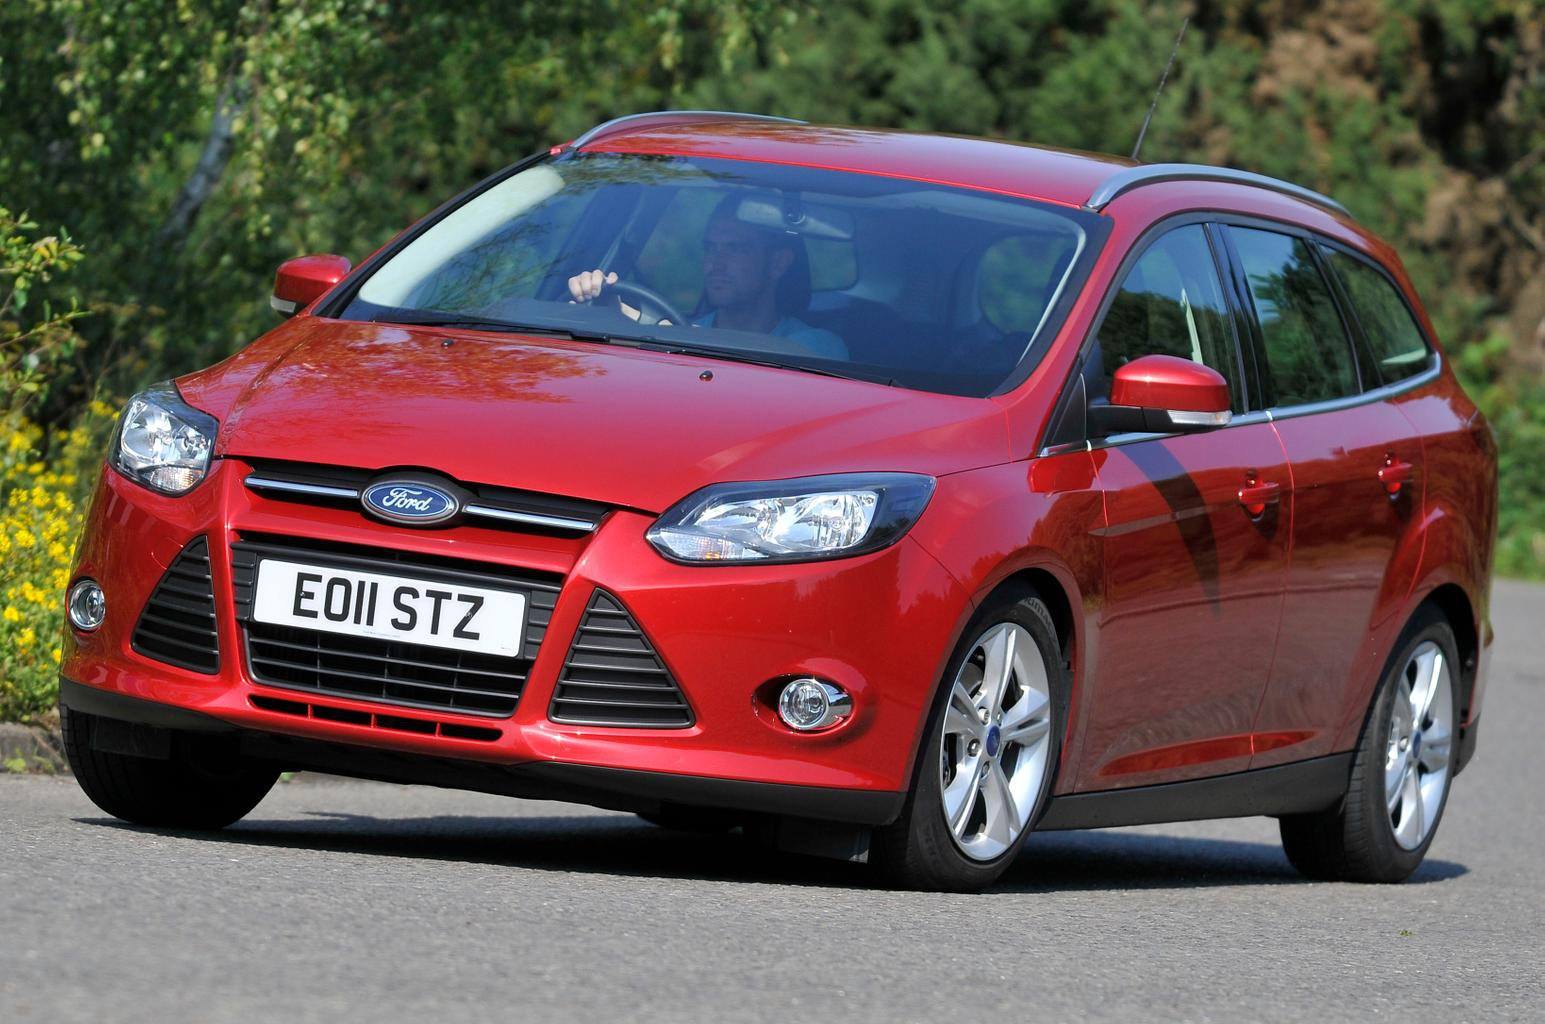 Used test – efficient estates: Ford Focus vs Skoda Octavia